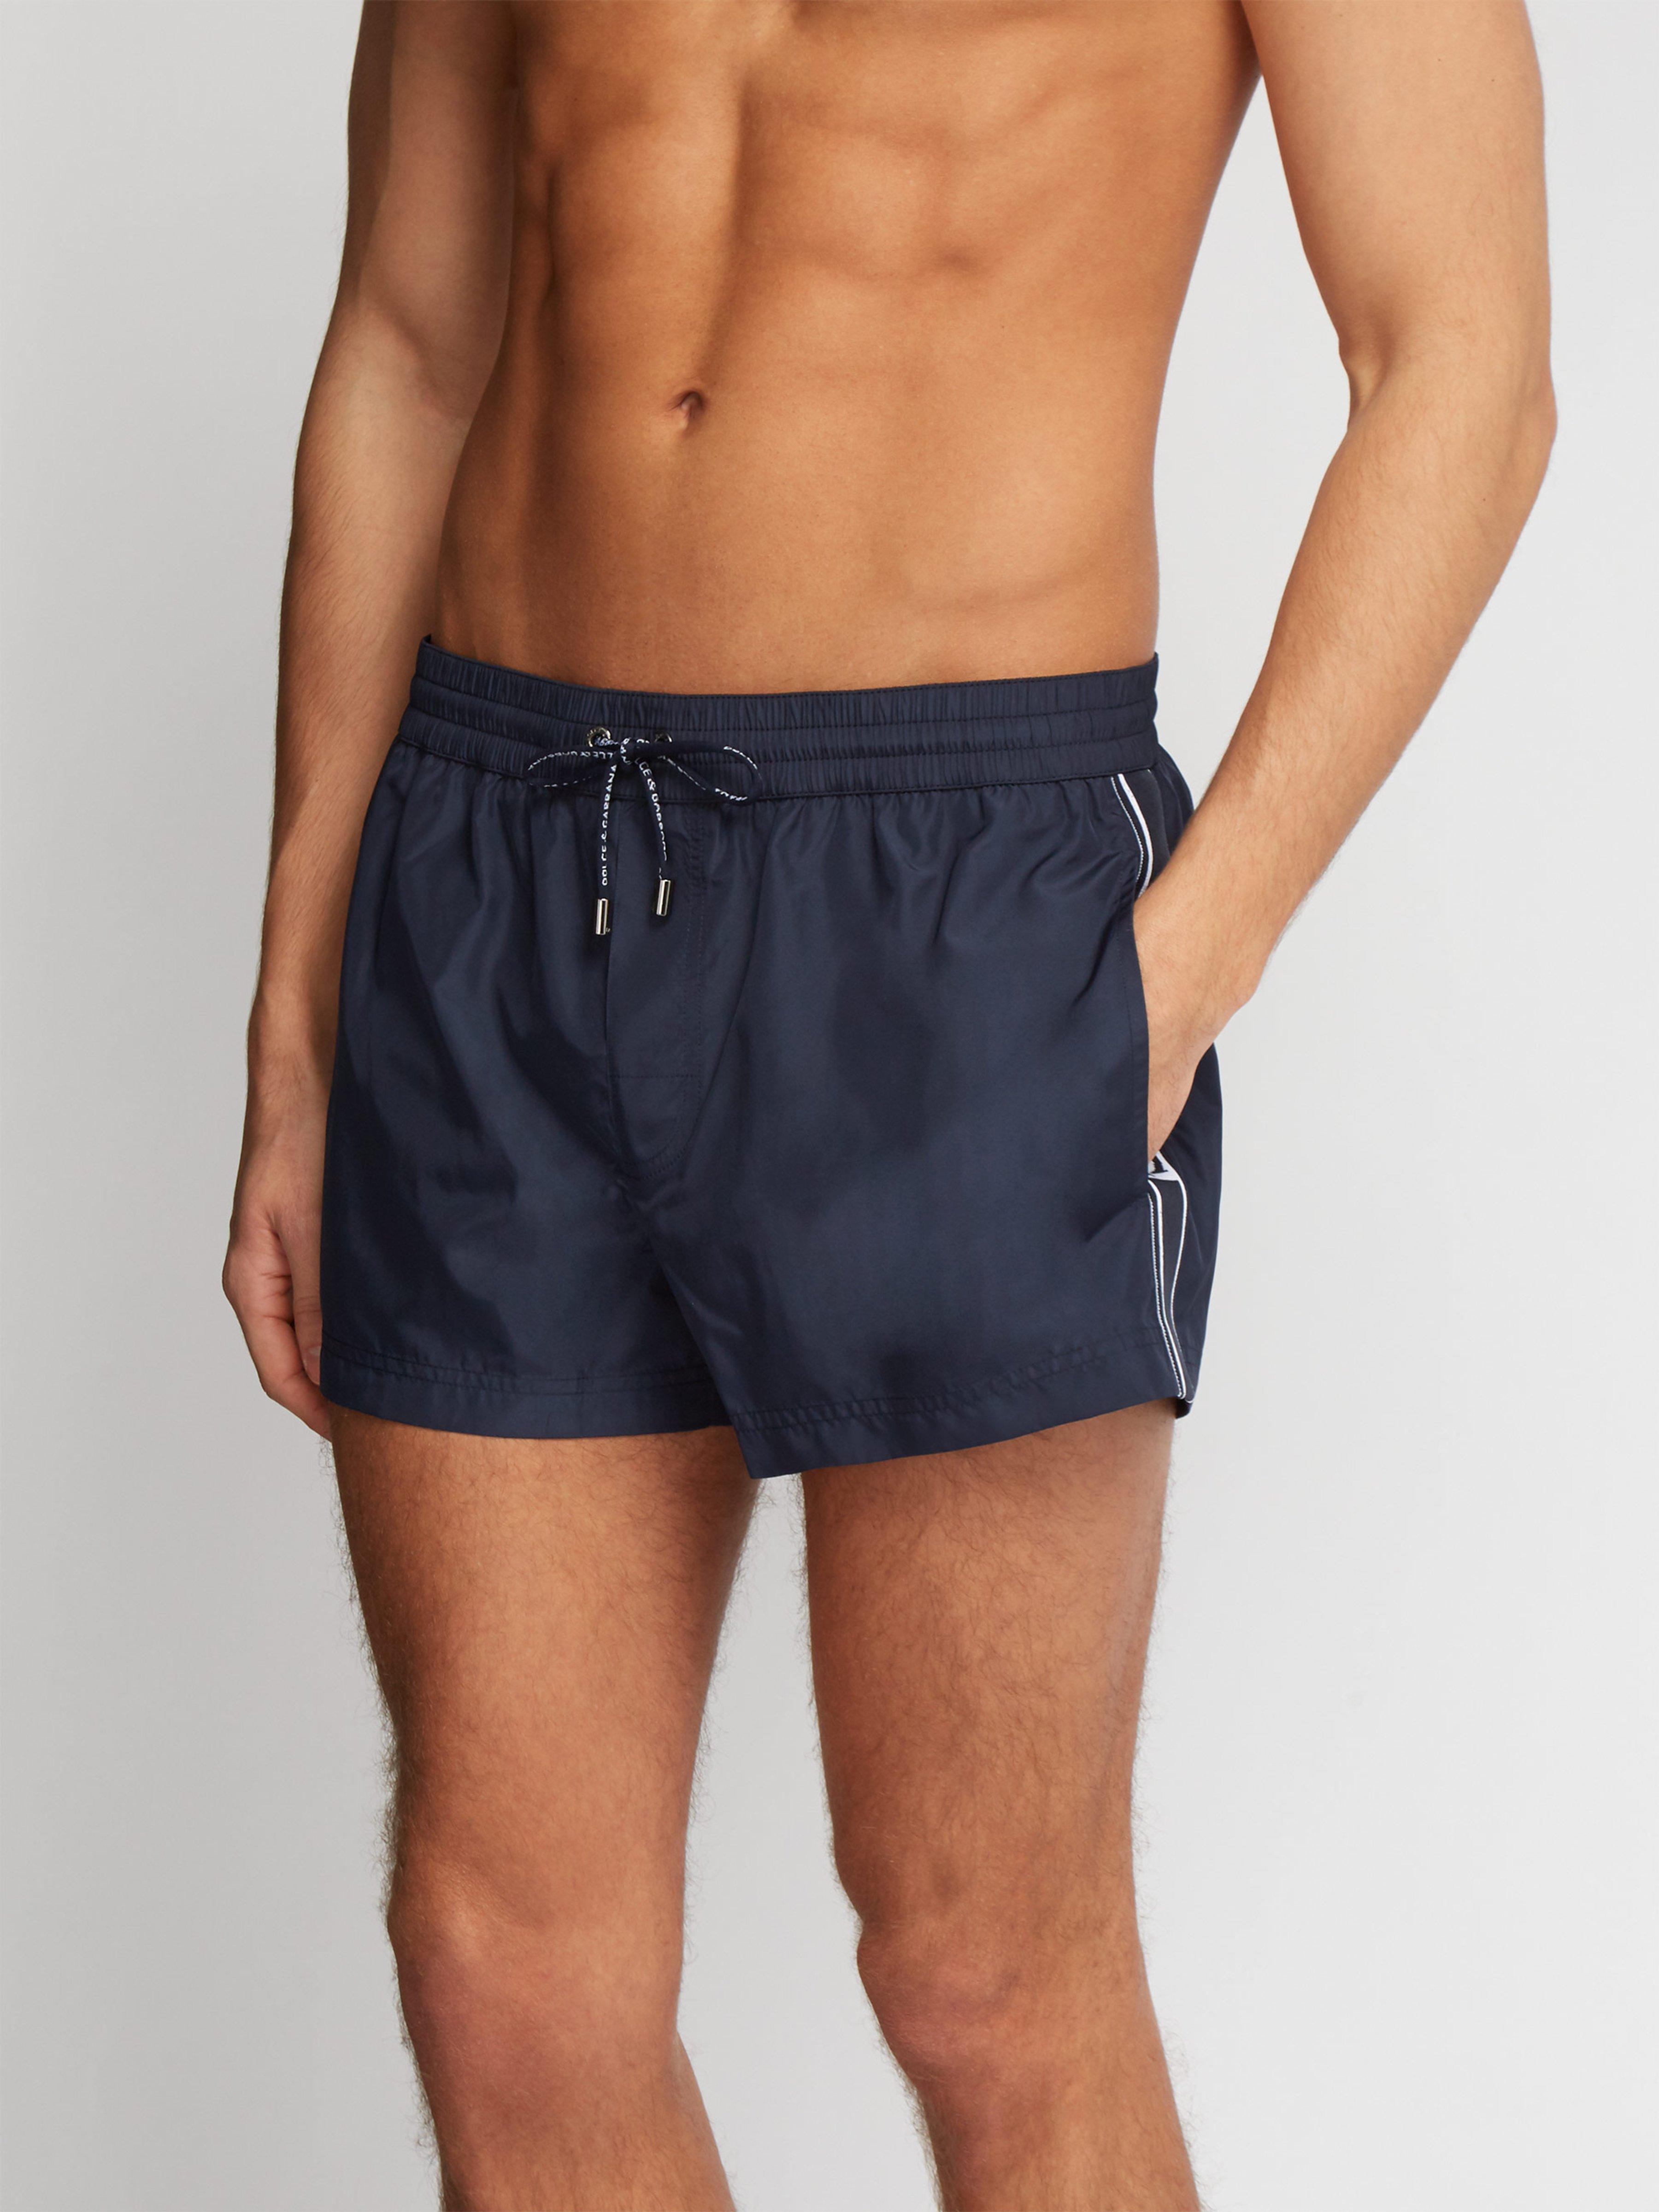 887e2cfcb1 Dolce & Gabbana Side Stripe Swim Shorts in Blue for Men - Lyst